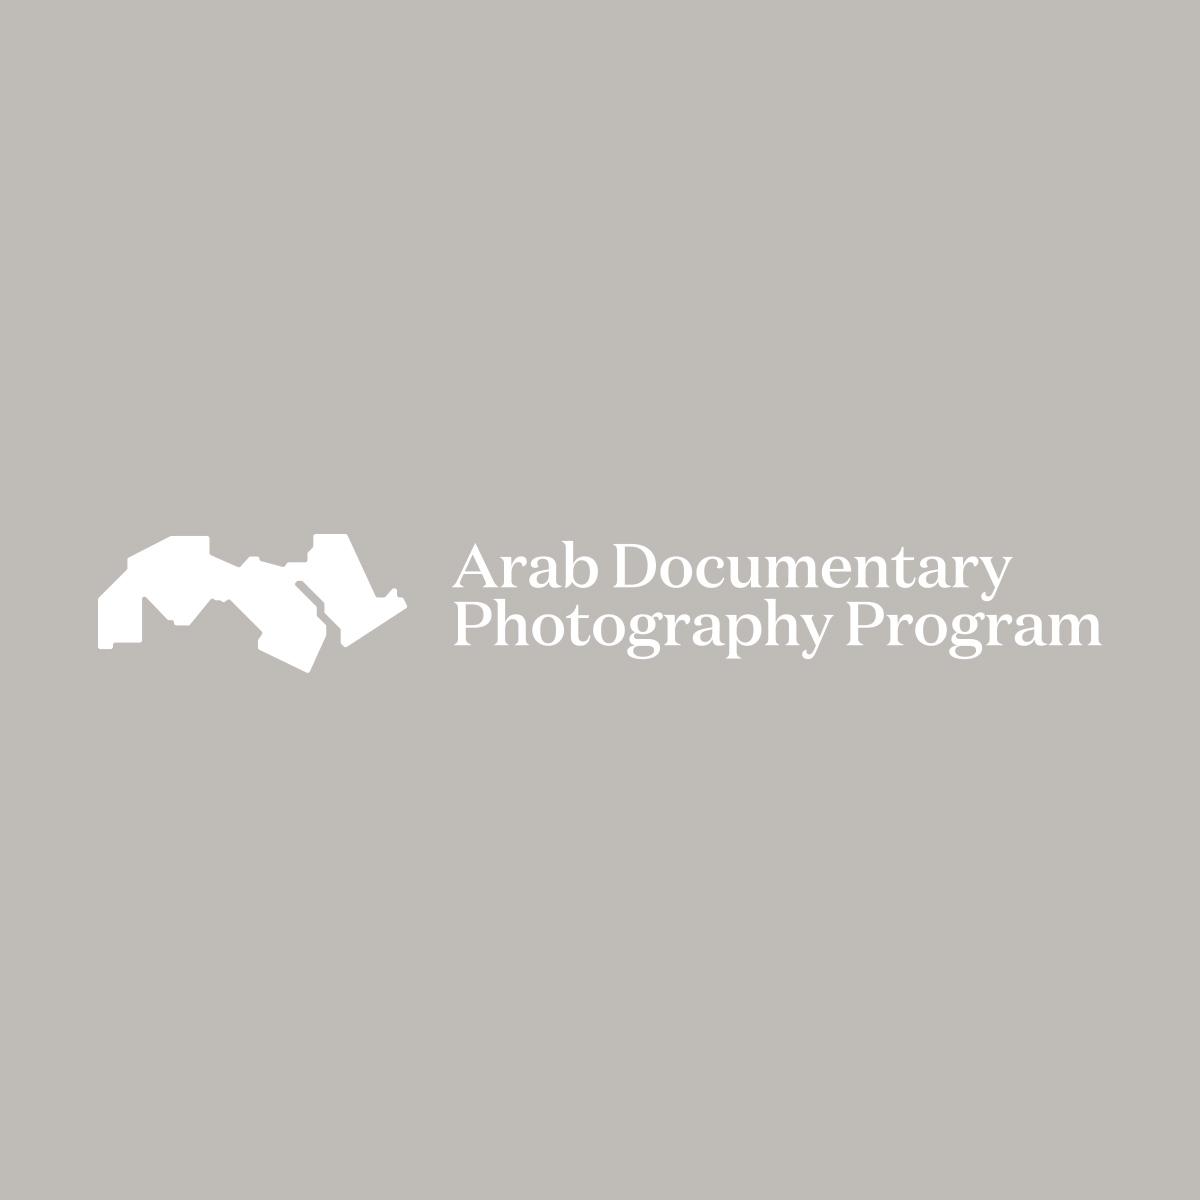 Studio Lighting Program: Arab Documentary Photography Program